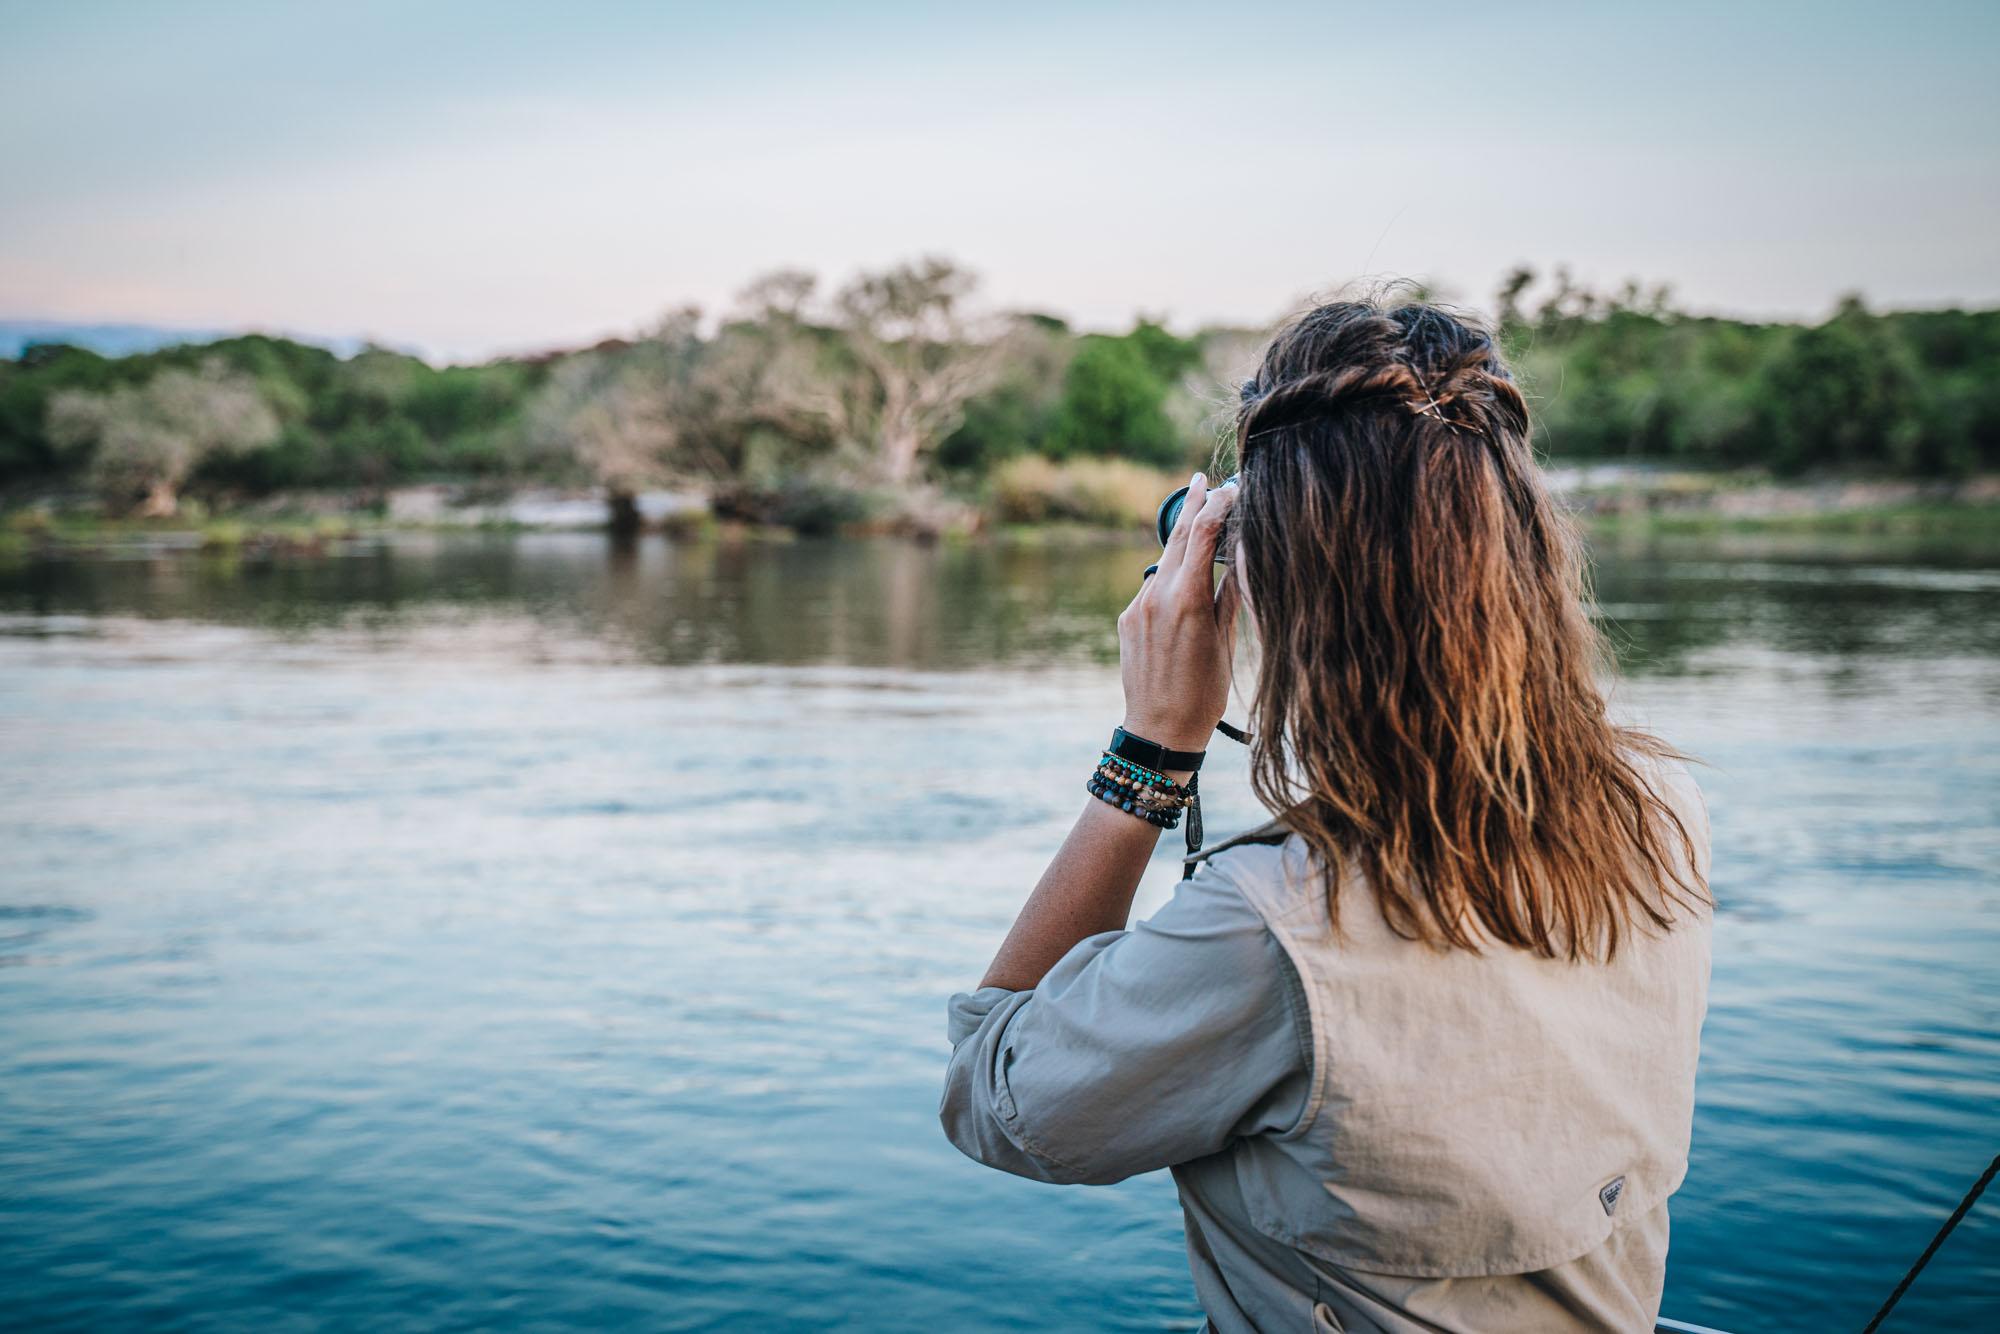 River Safari in Zambezi National Park, Victoria Falls activities